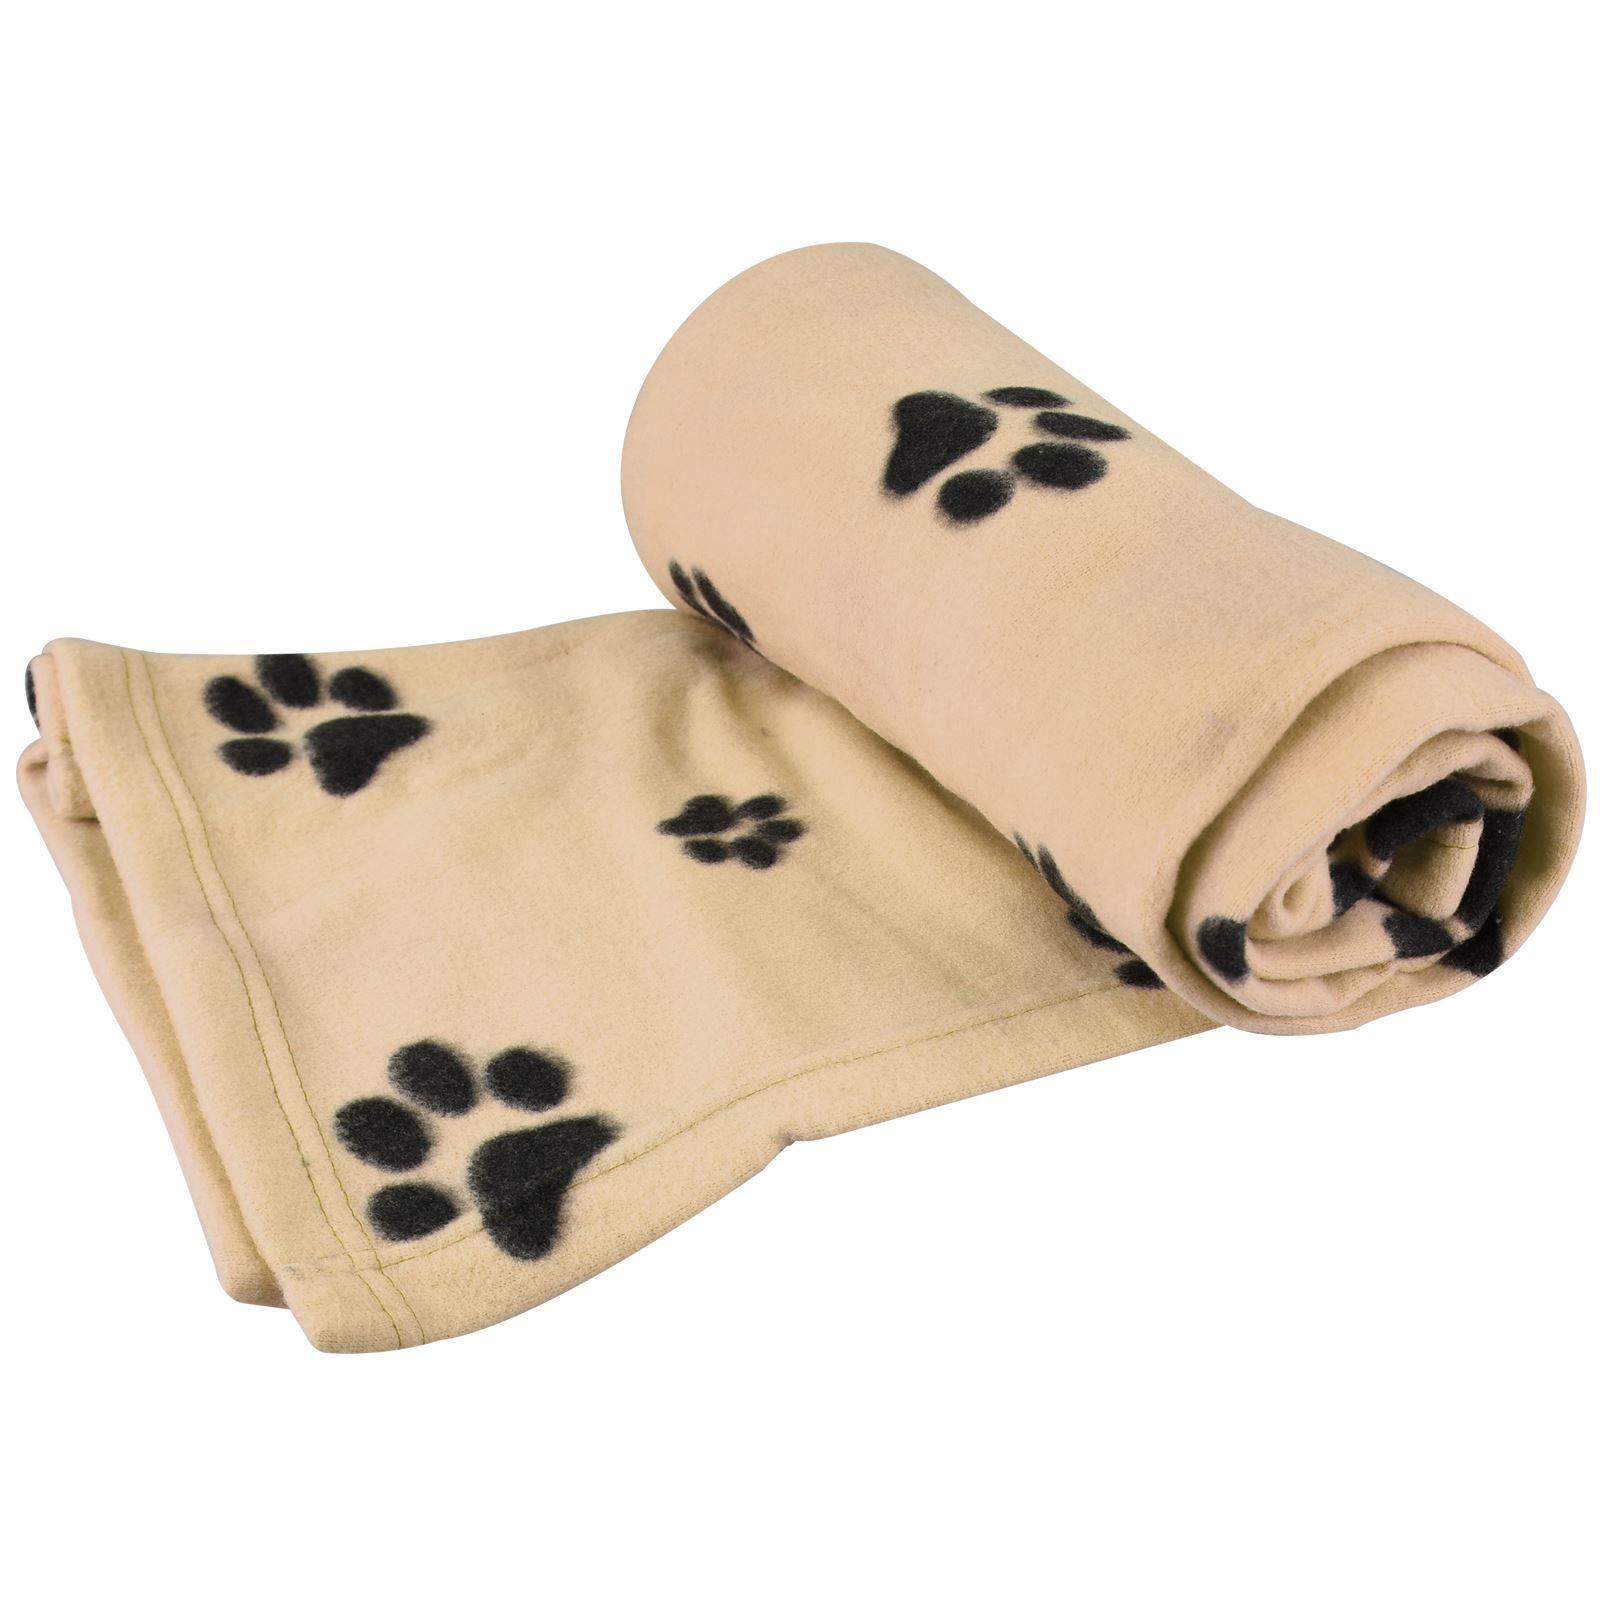 Warm-Pet-Mat-Paw-Print-Cat-Dog-Puppy-Fleece-Soft-Blanket-Bed-Cushion-One-Size thumbnail 4